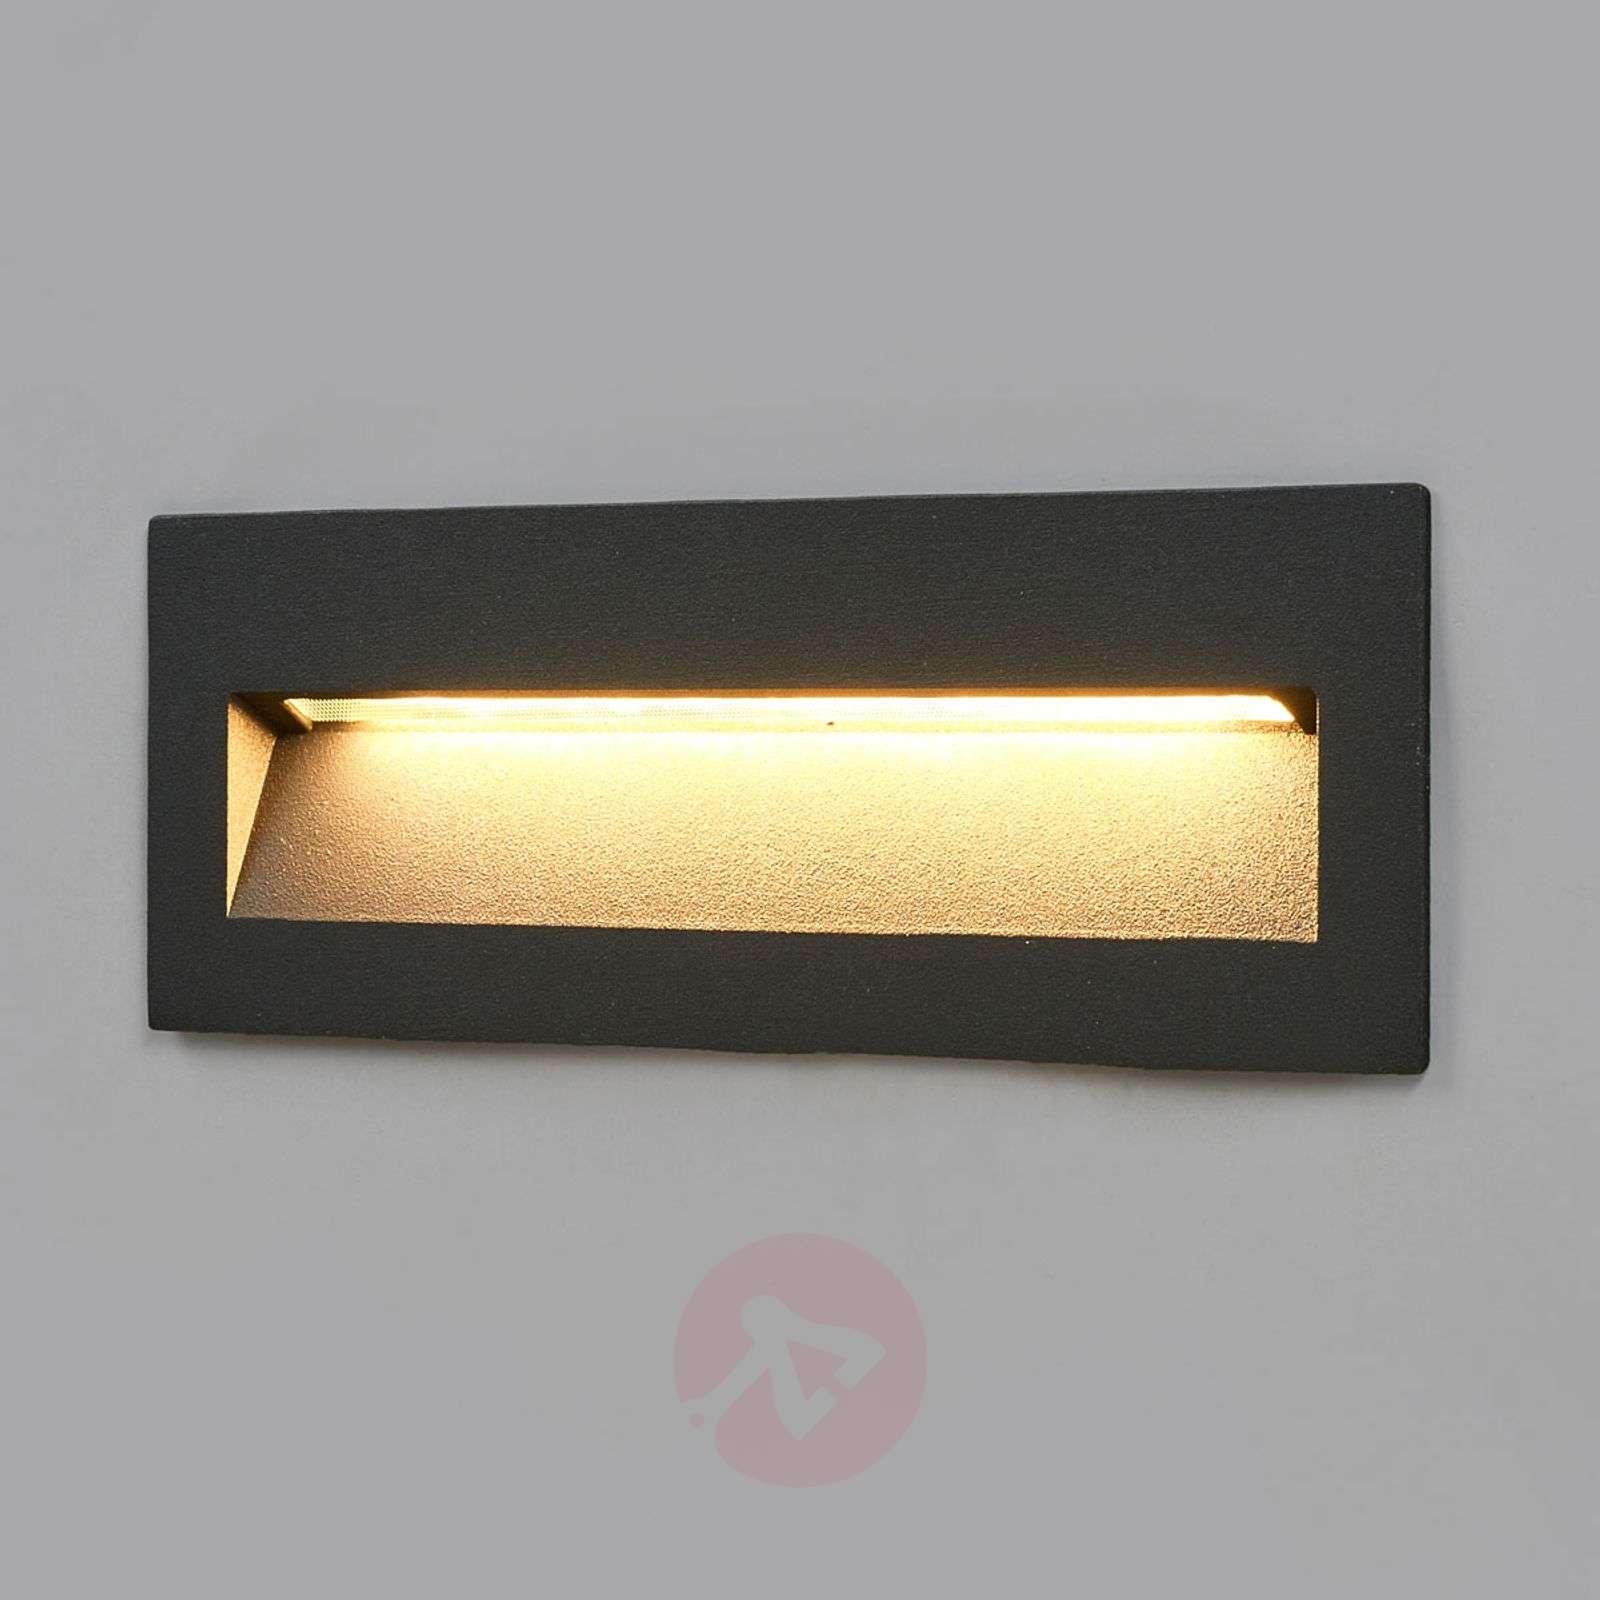 Recessed Outdoor Lighting Wall - Outdoor Lighting Ideas